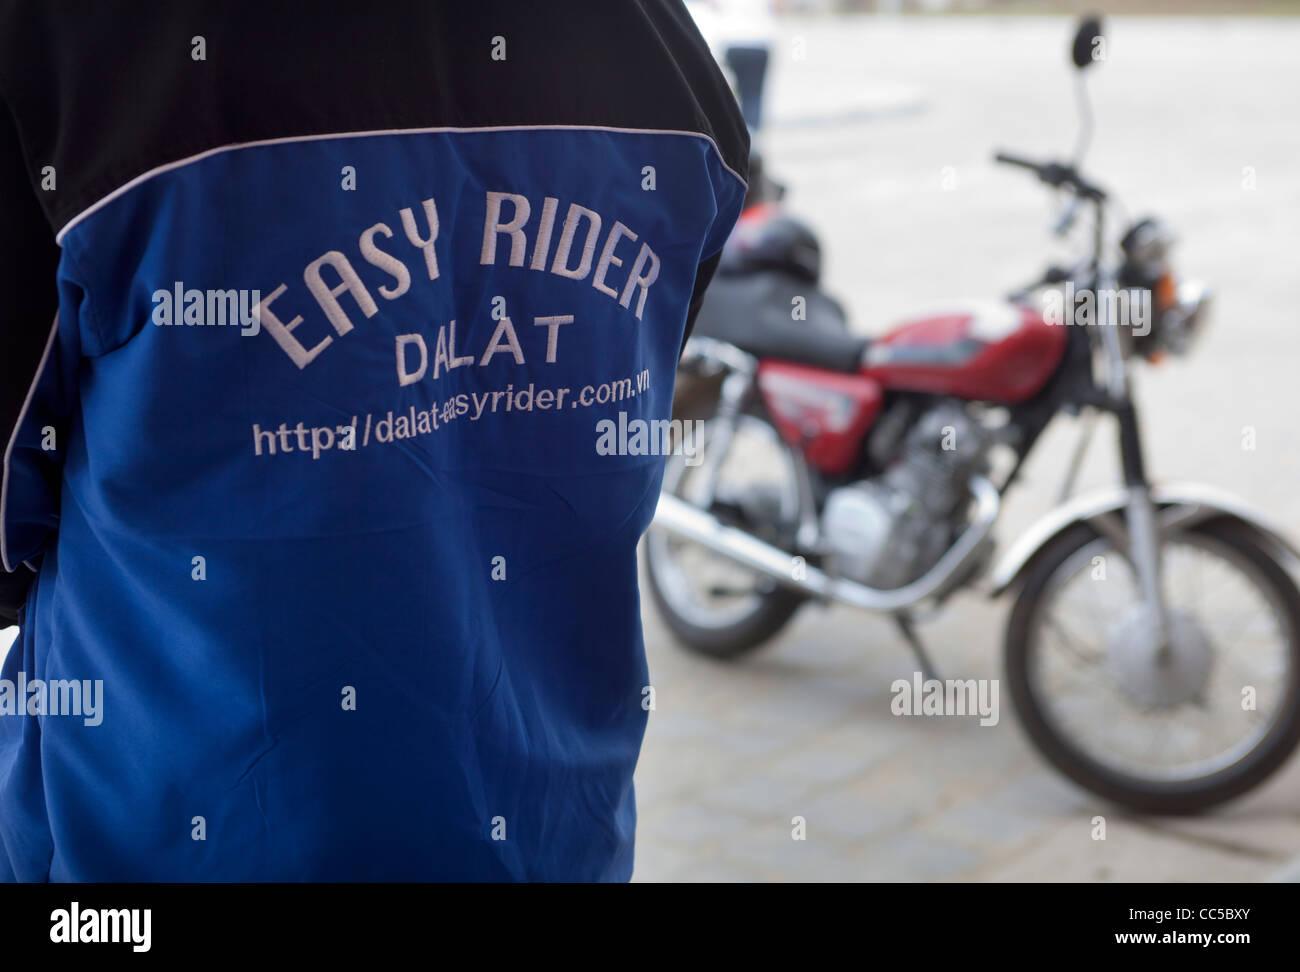 Easy Rider Motor Cycle Travel Guide Dalat - Stock Image